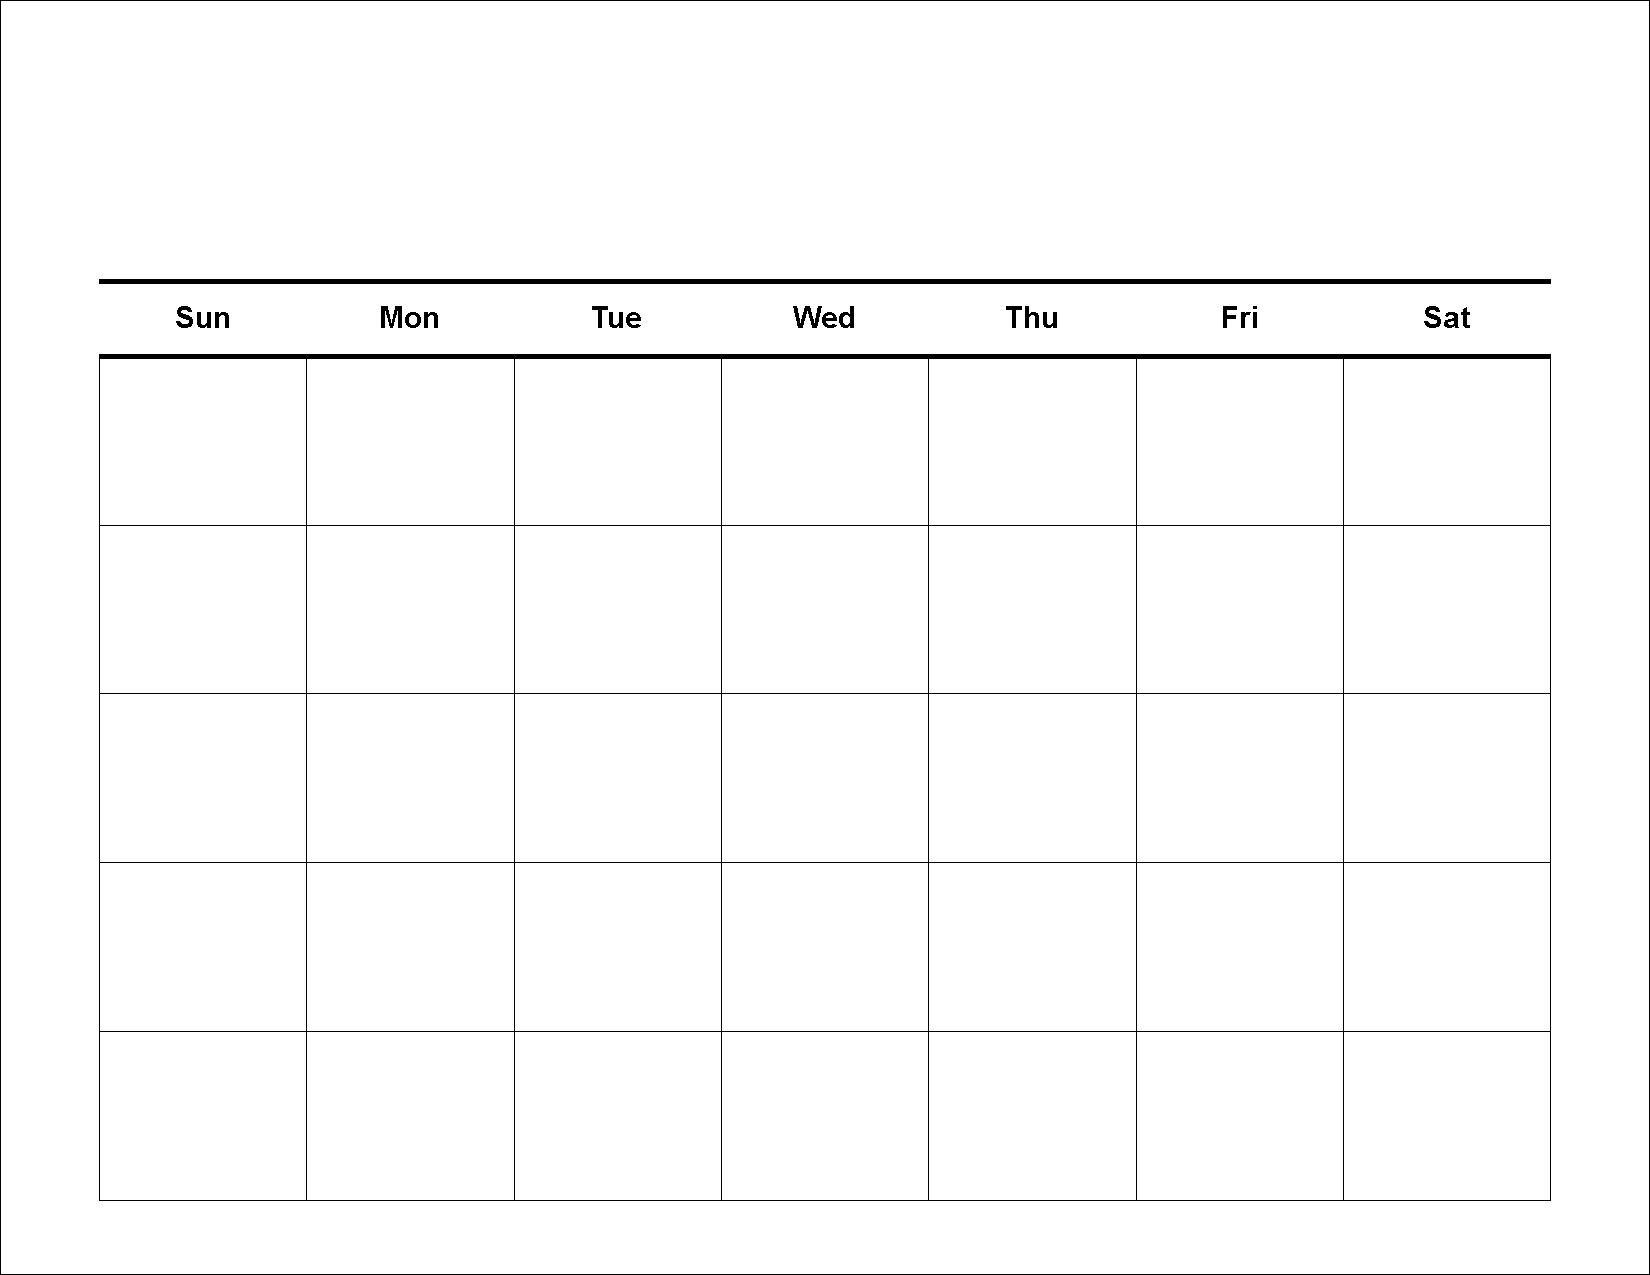 Blank 5 Day Week Calendar | Template Calendar Printable pertaining to 5 Day Week Calendar Printable